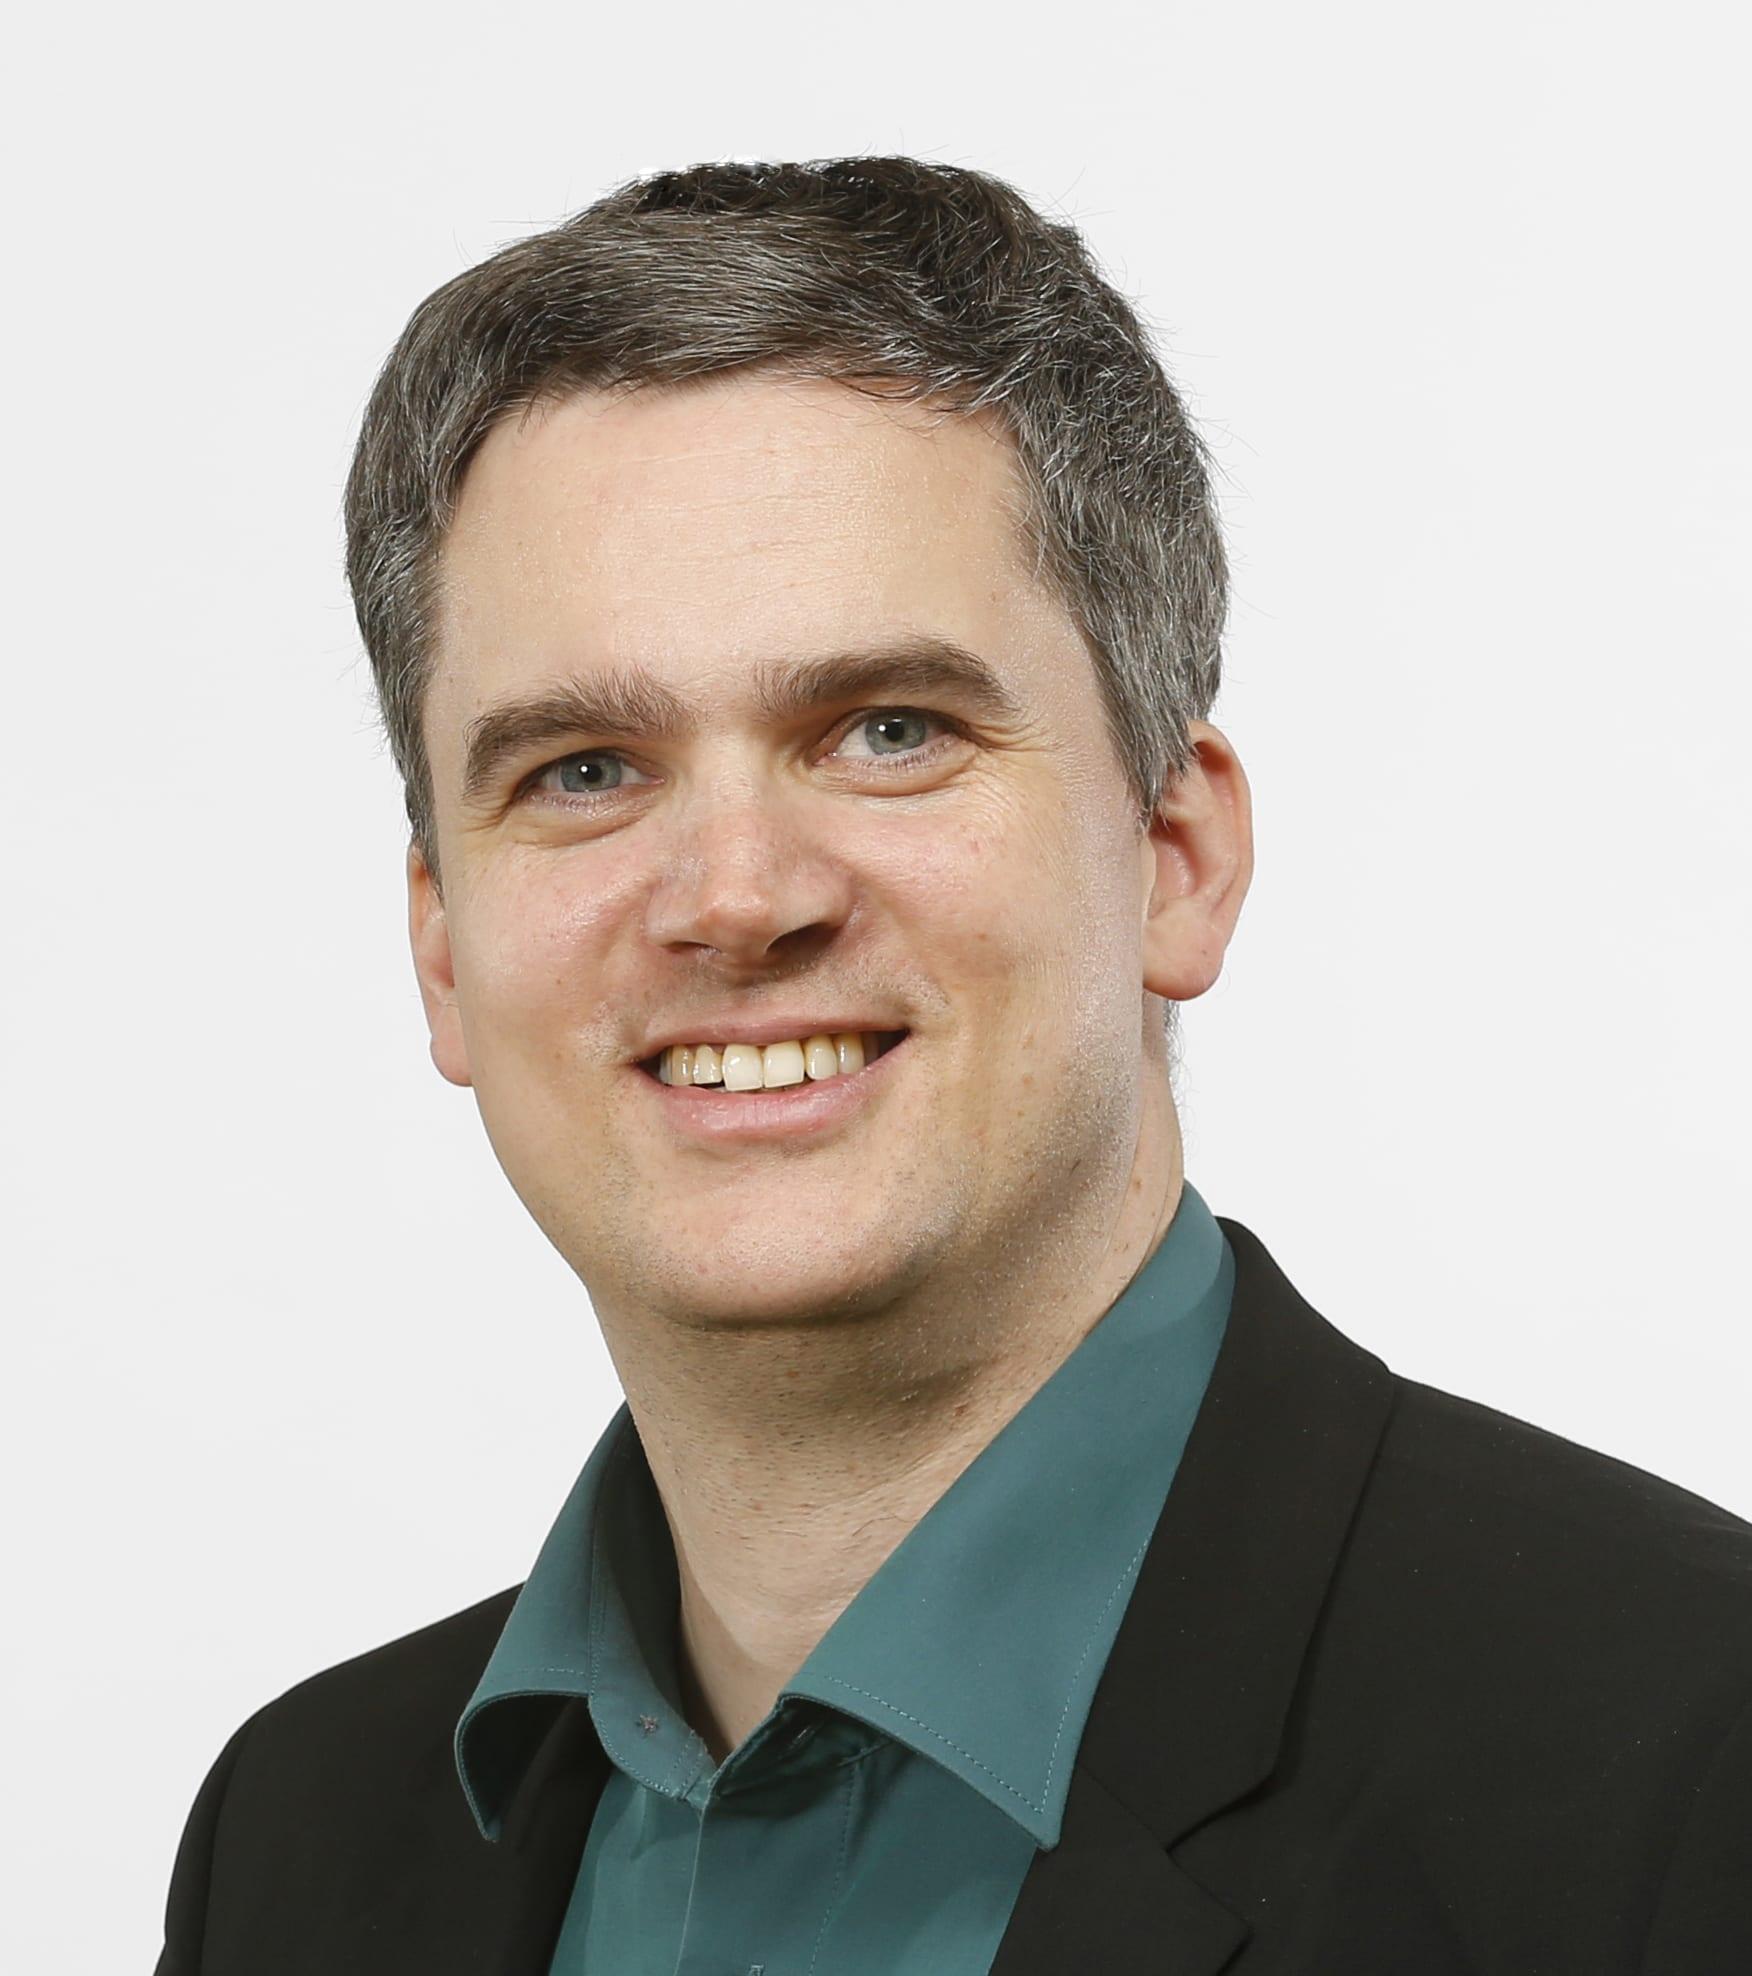 Olaf Christiansen, PHOENIX group